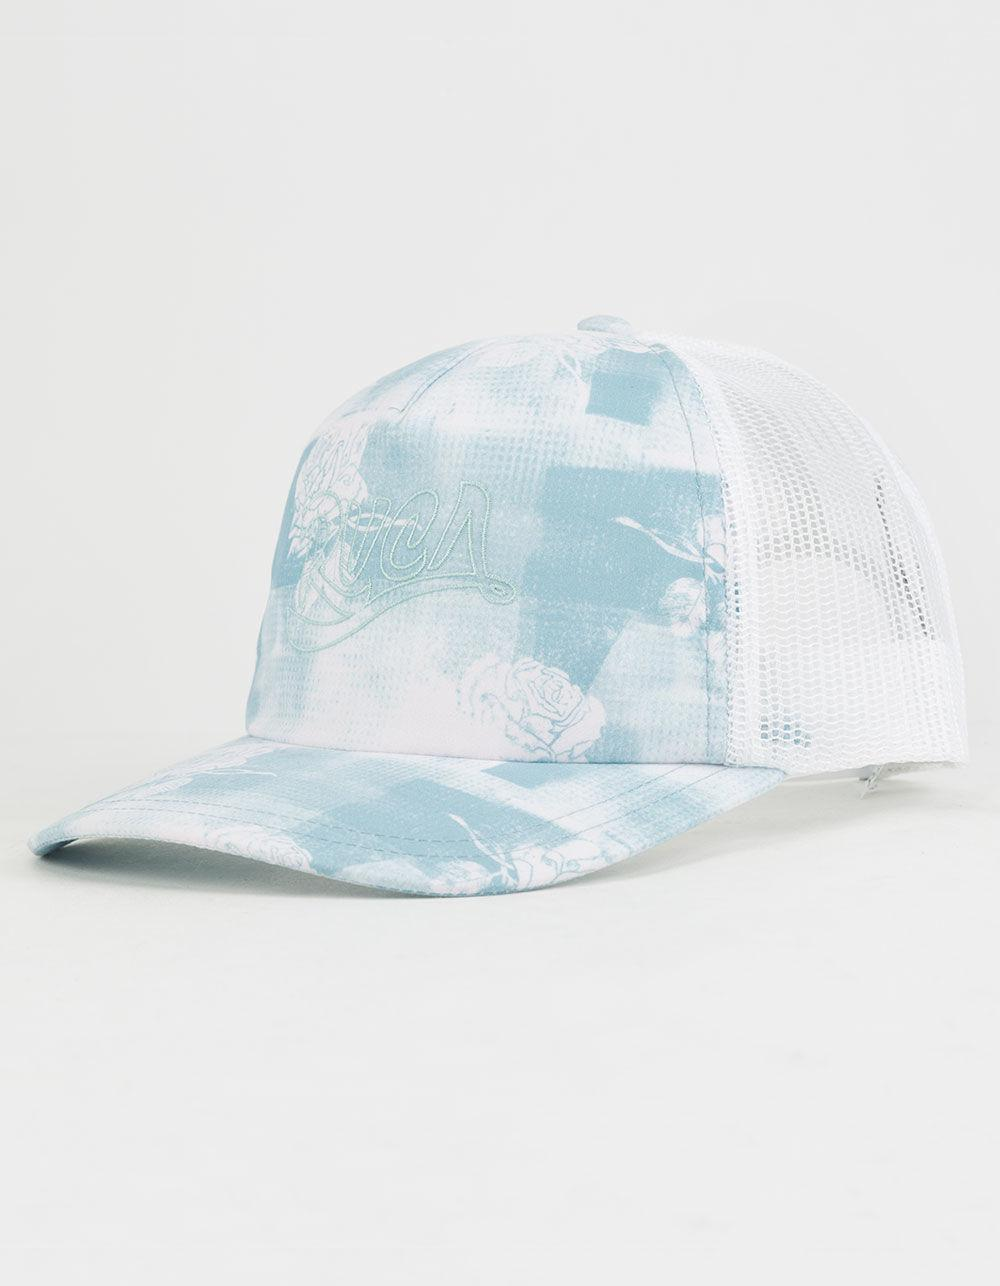 2b2ae8511ce9f ... authentic shop lyst rvca offbeat womens trucker hat in blue for men  b55ef 833f6 2b887 ab0e0 ...